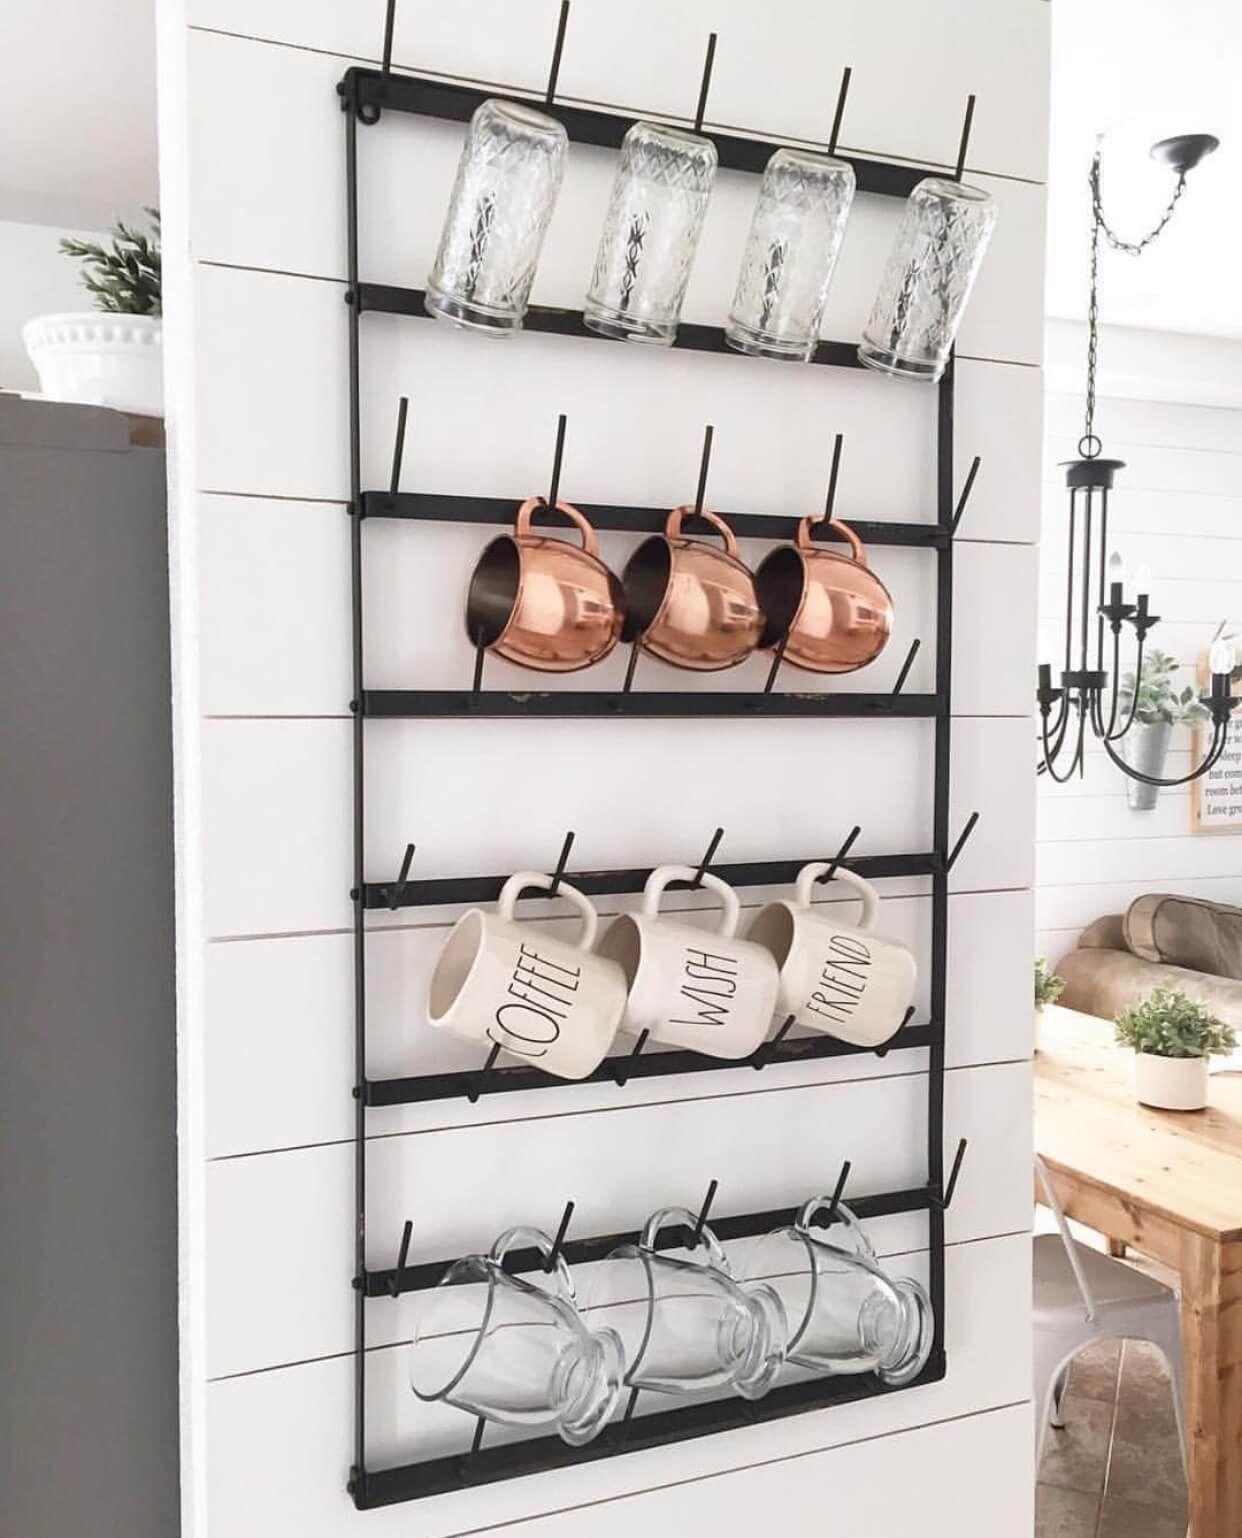 45 Practical Storage Ideas For A Small Kitchen Organization Kitchen On A Budget Modern Farmhouse Decor Small Kitchen Storage